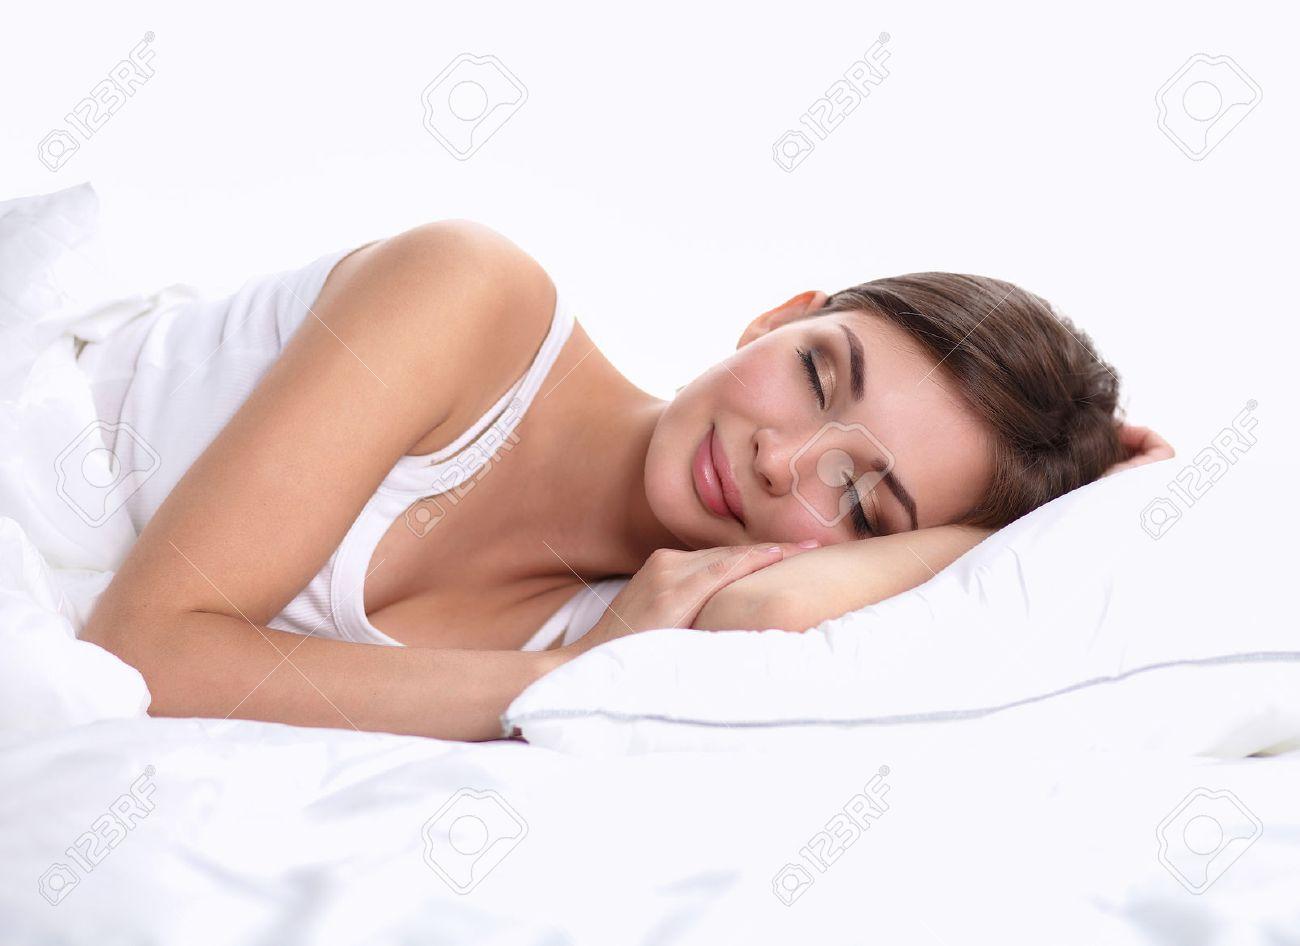 Mooi meisje slaapt in de slaapkamer liggend op bed geïsoleerde